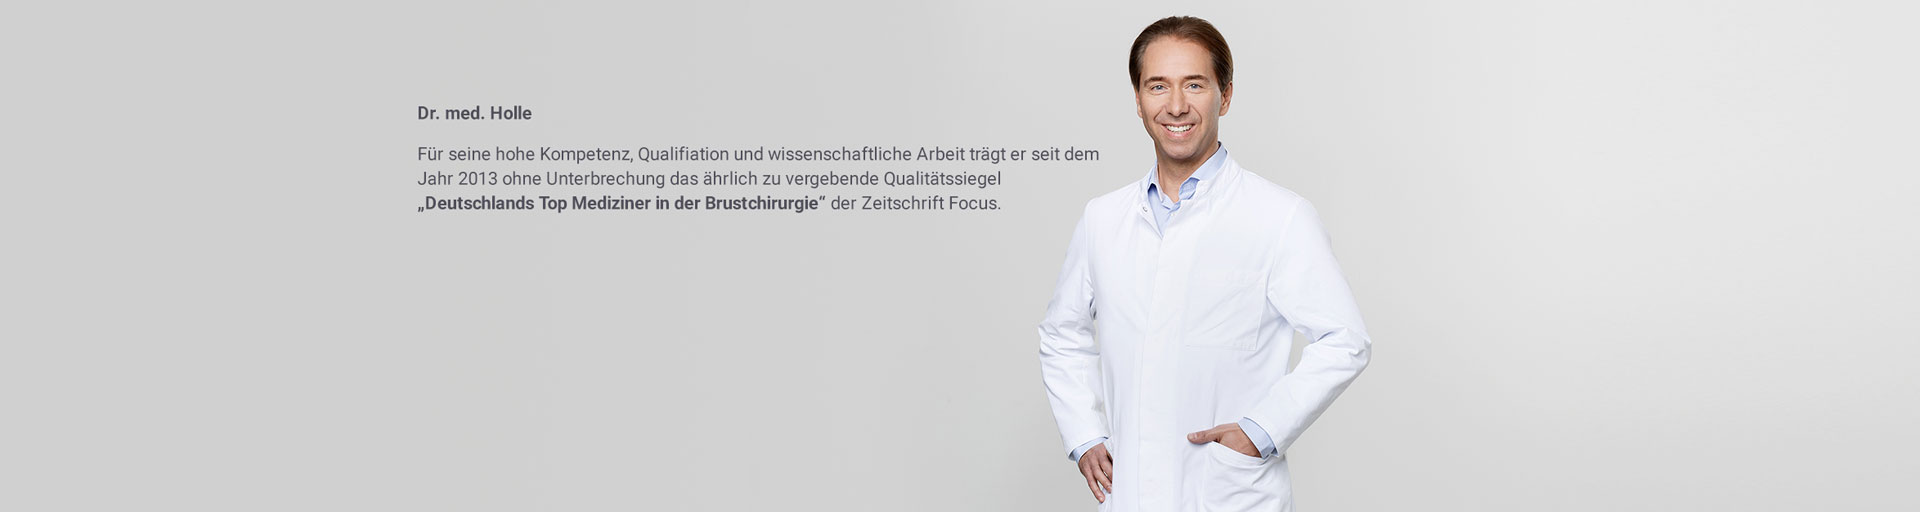 dr-holle-vita-1024-b